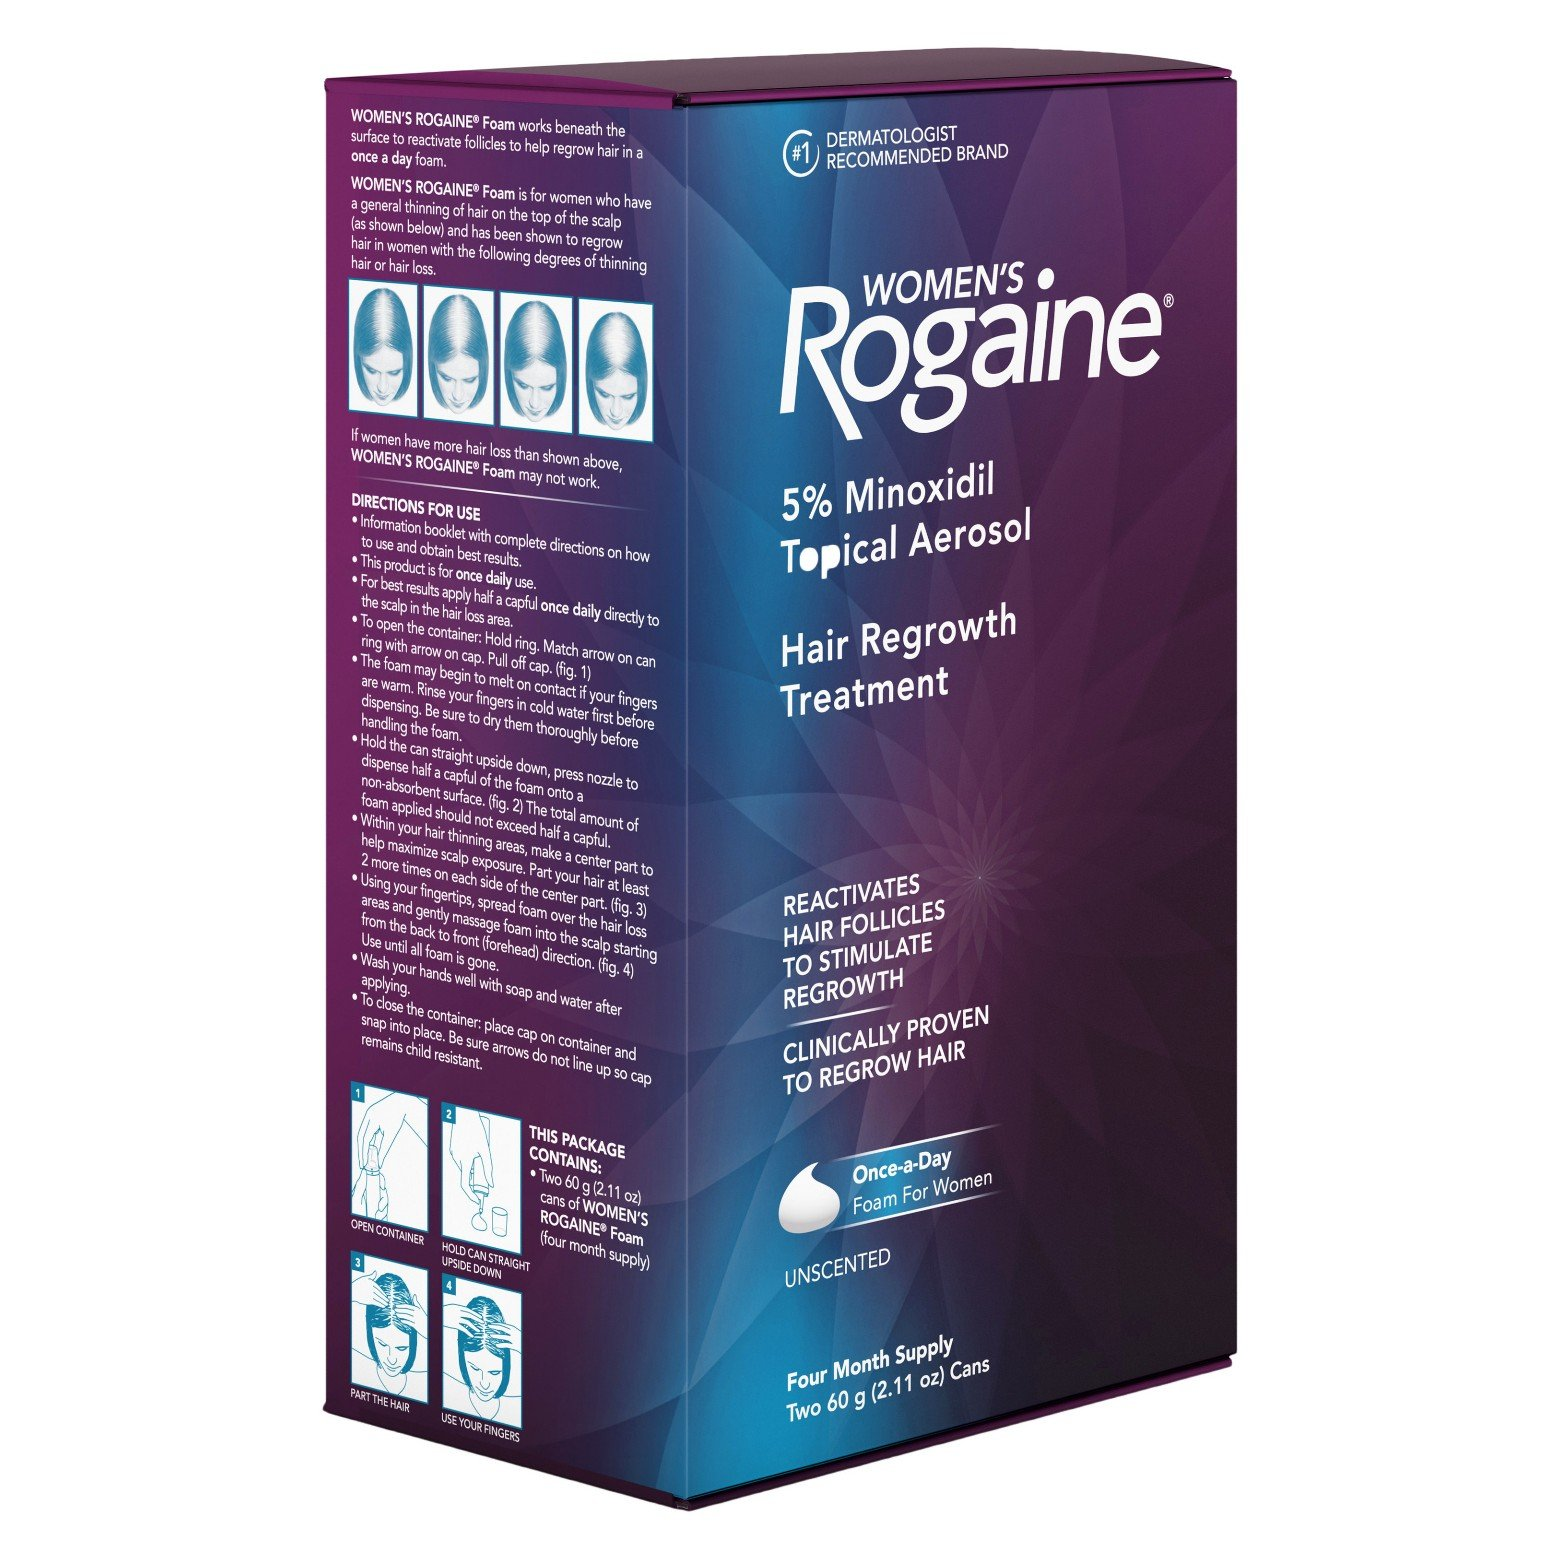 Women's Rogaine Hair Regrowth Treatment Foam, 4 Month Supply